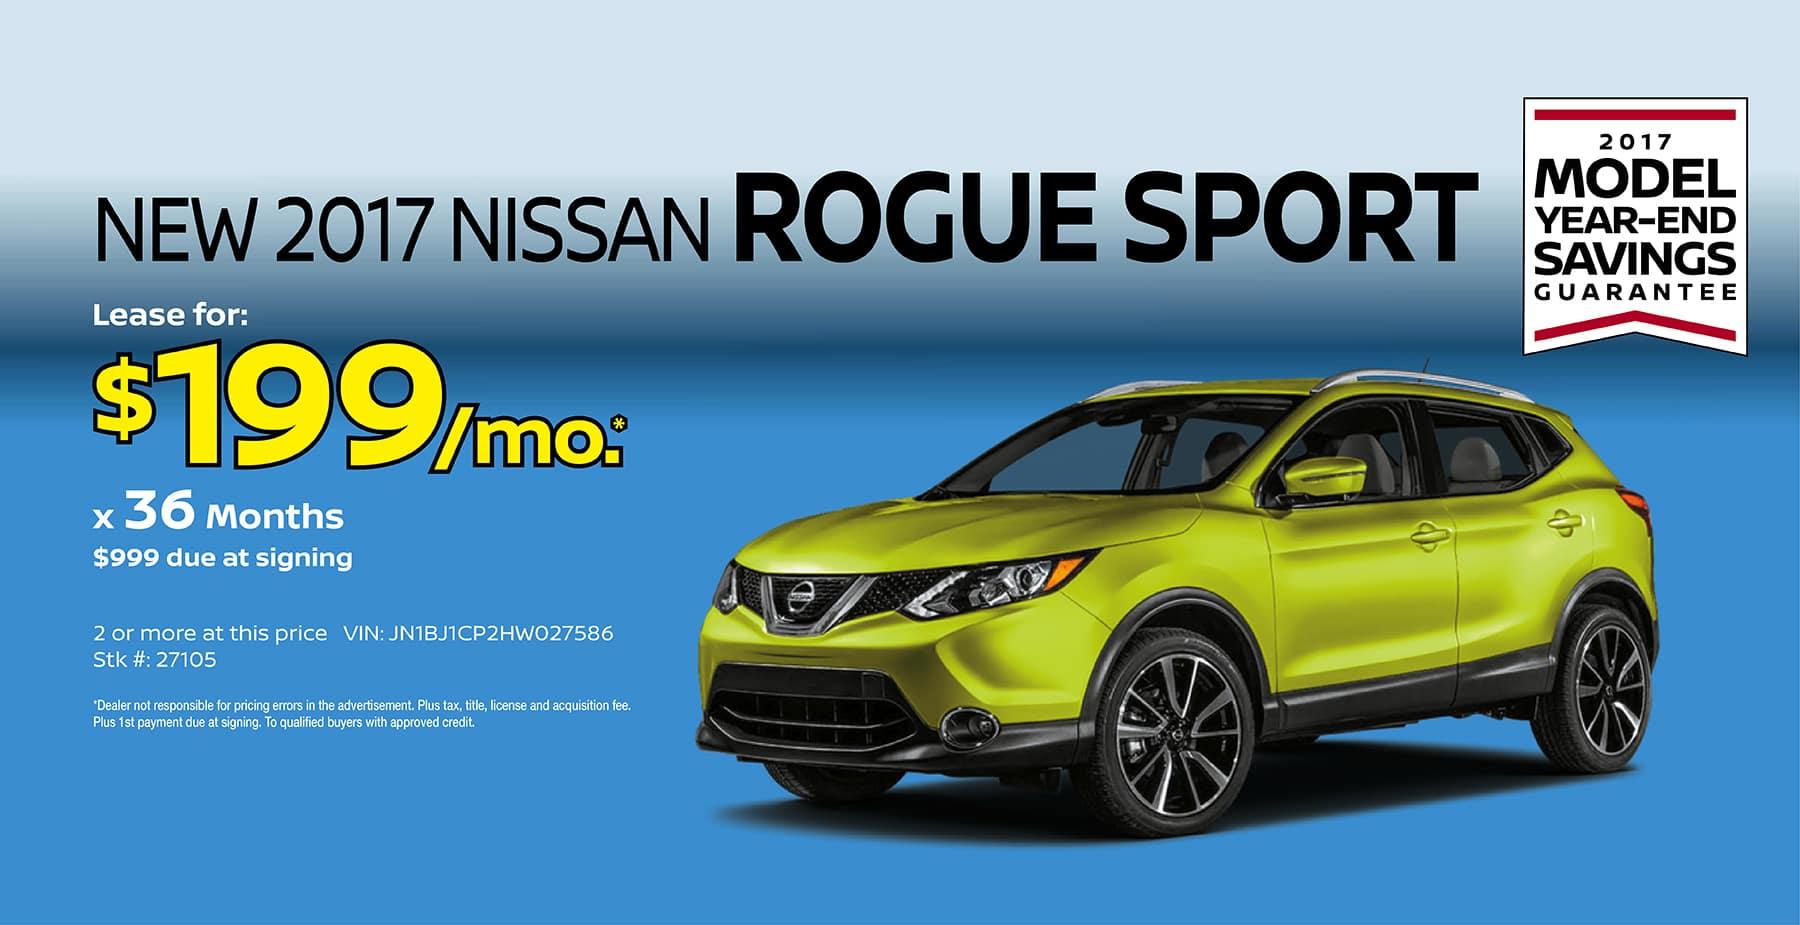 2017 Nissan Rogue Sport Lease Deals | Lamoureph Blog